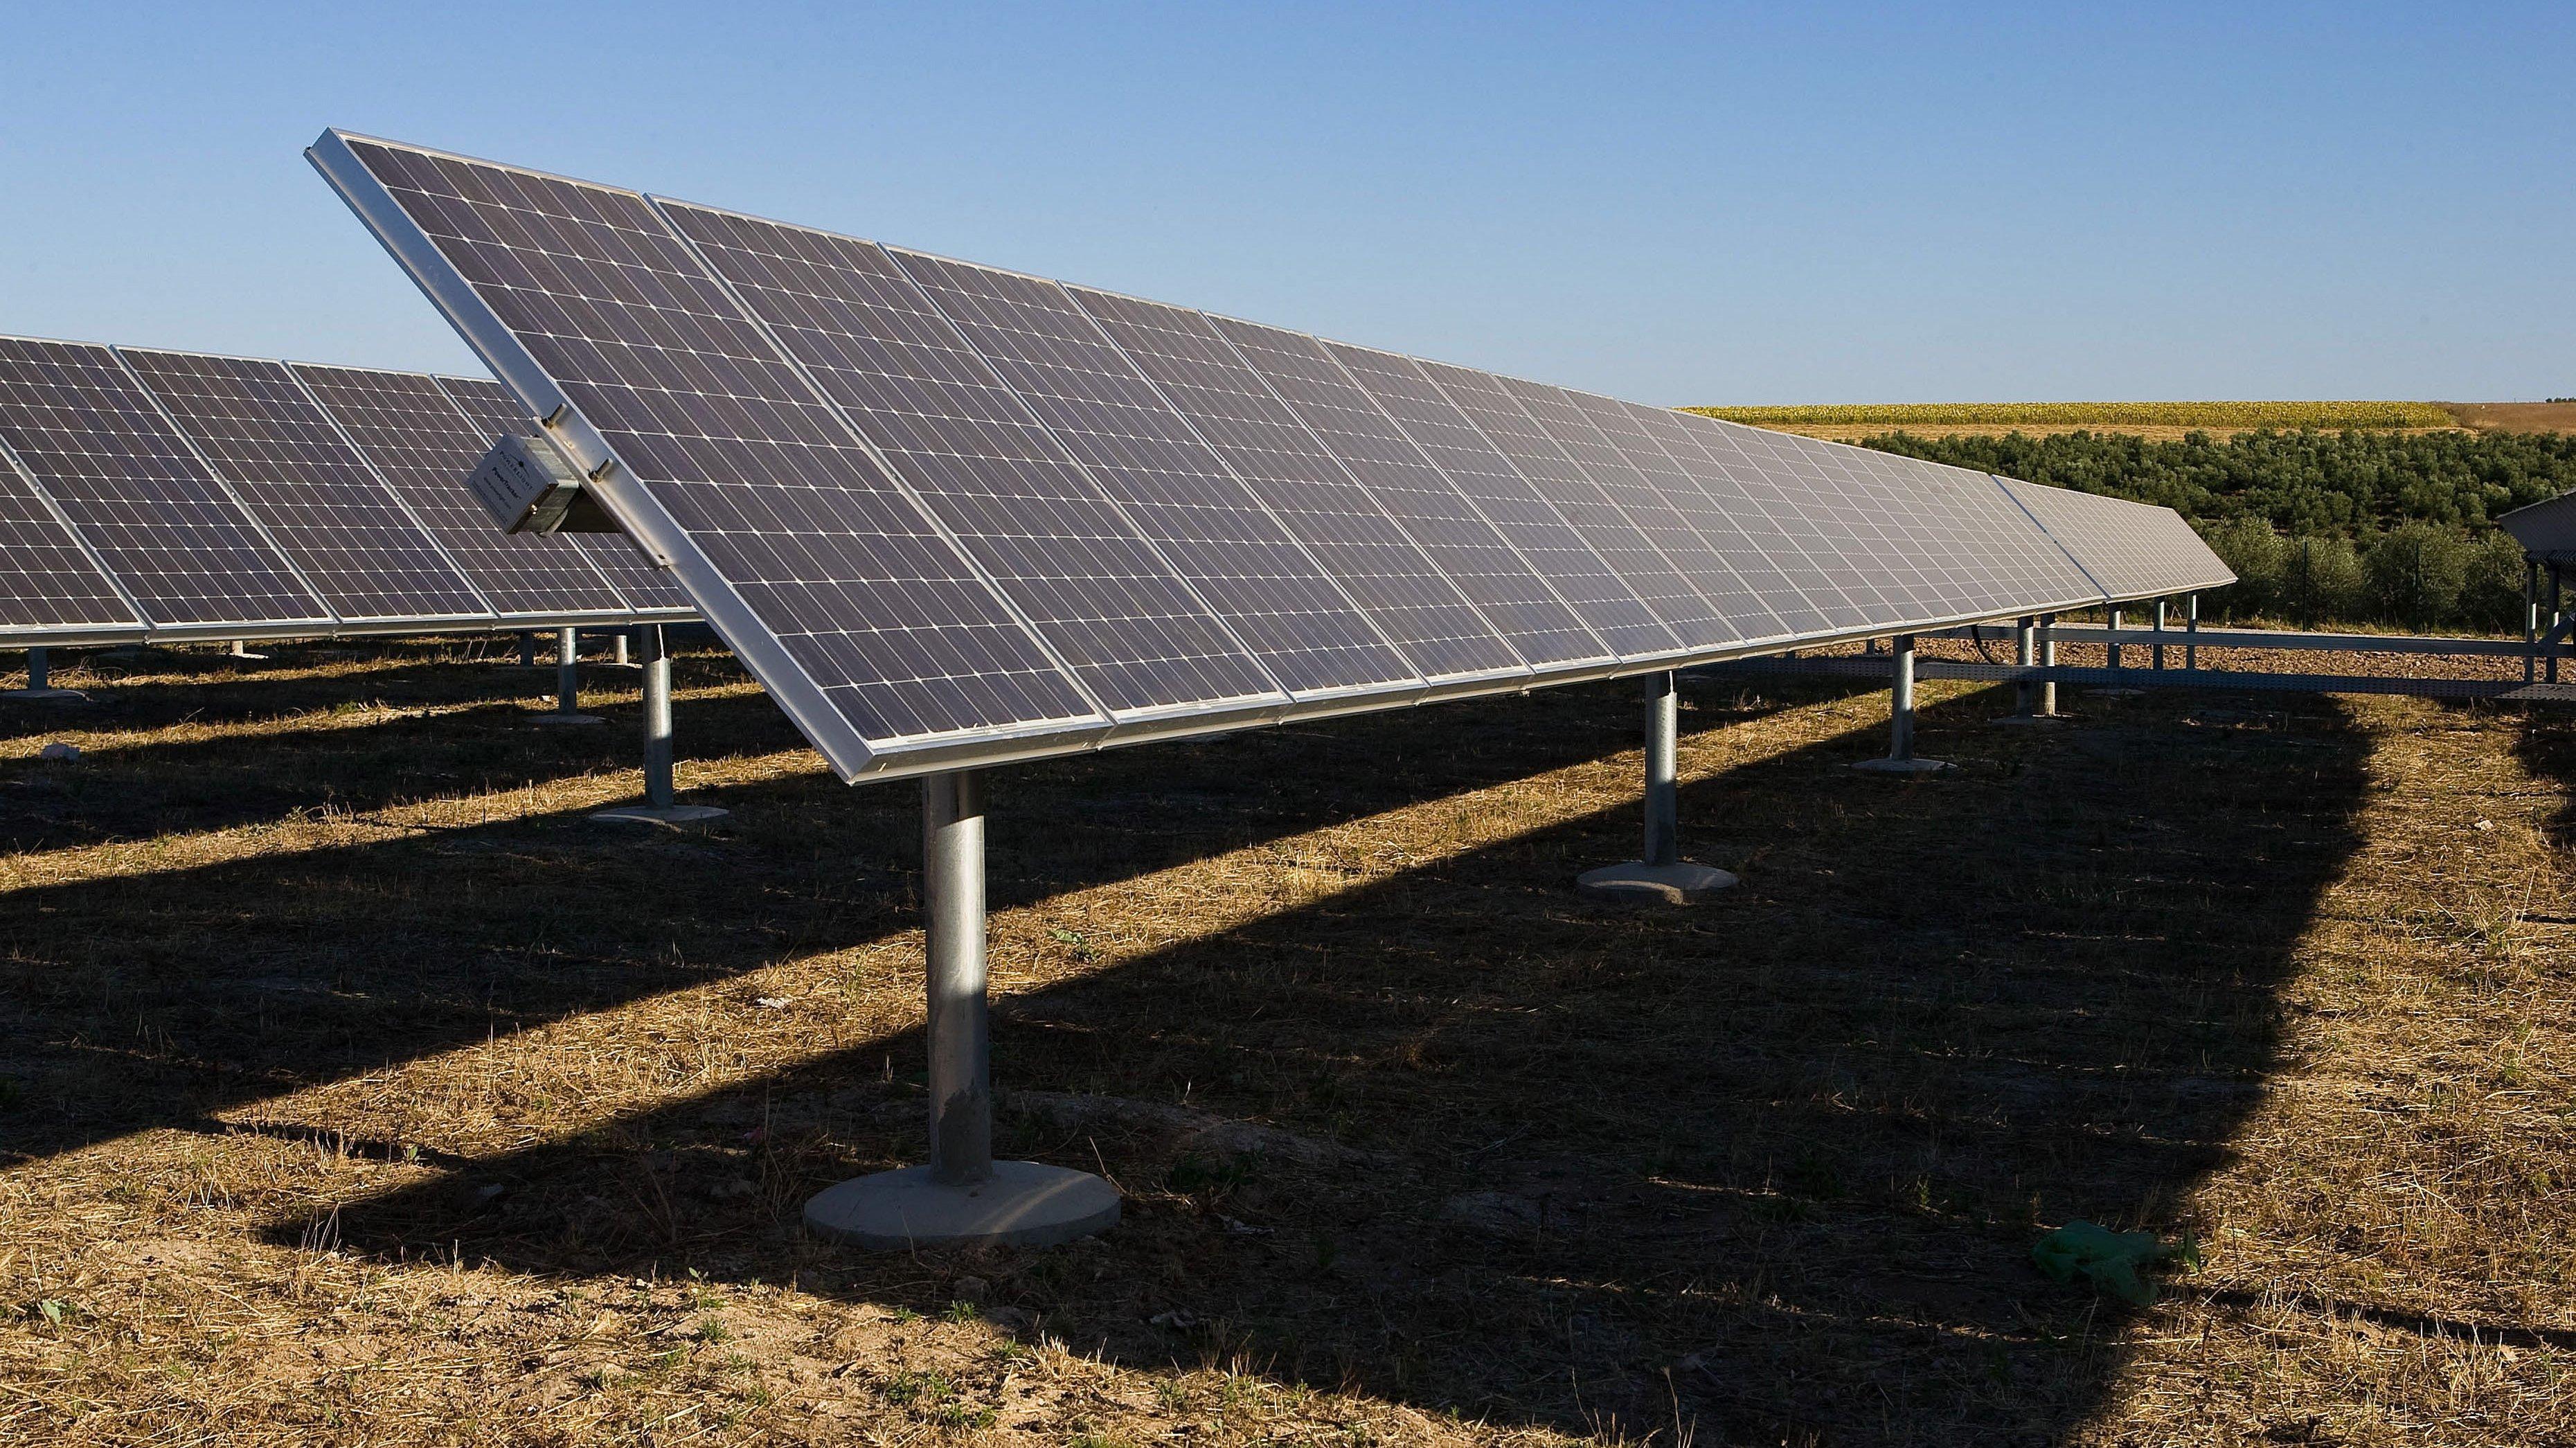 Serpa (Portugal) : Solar photovoltaic power plant